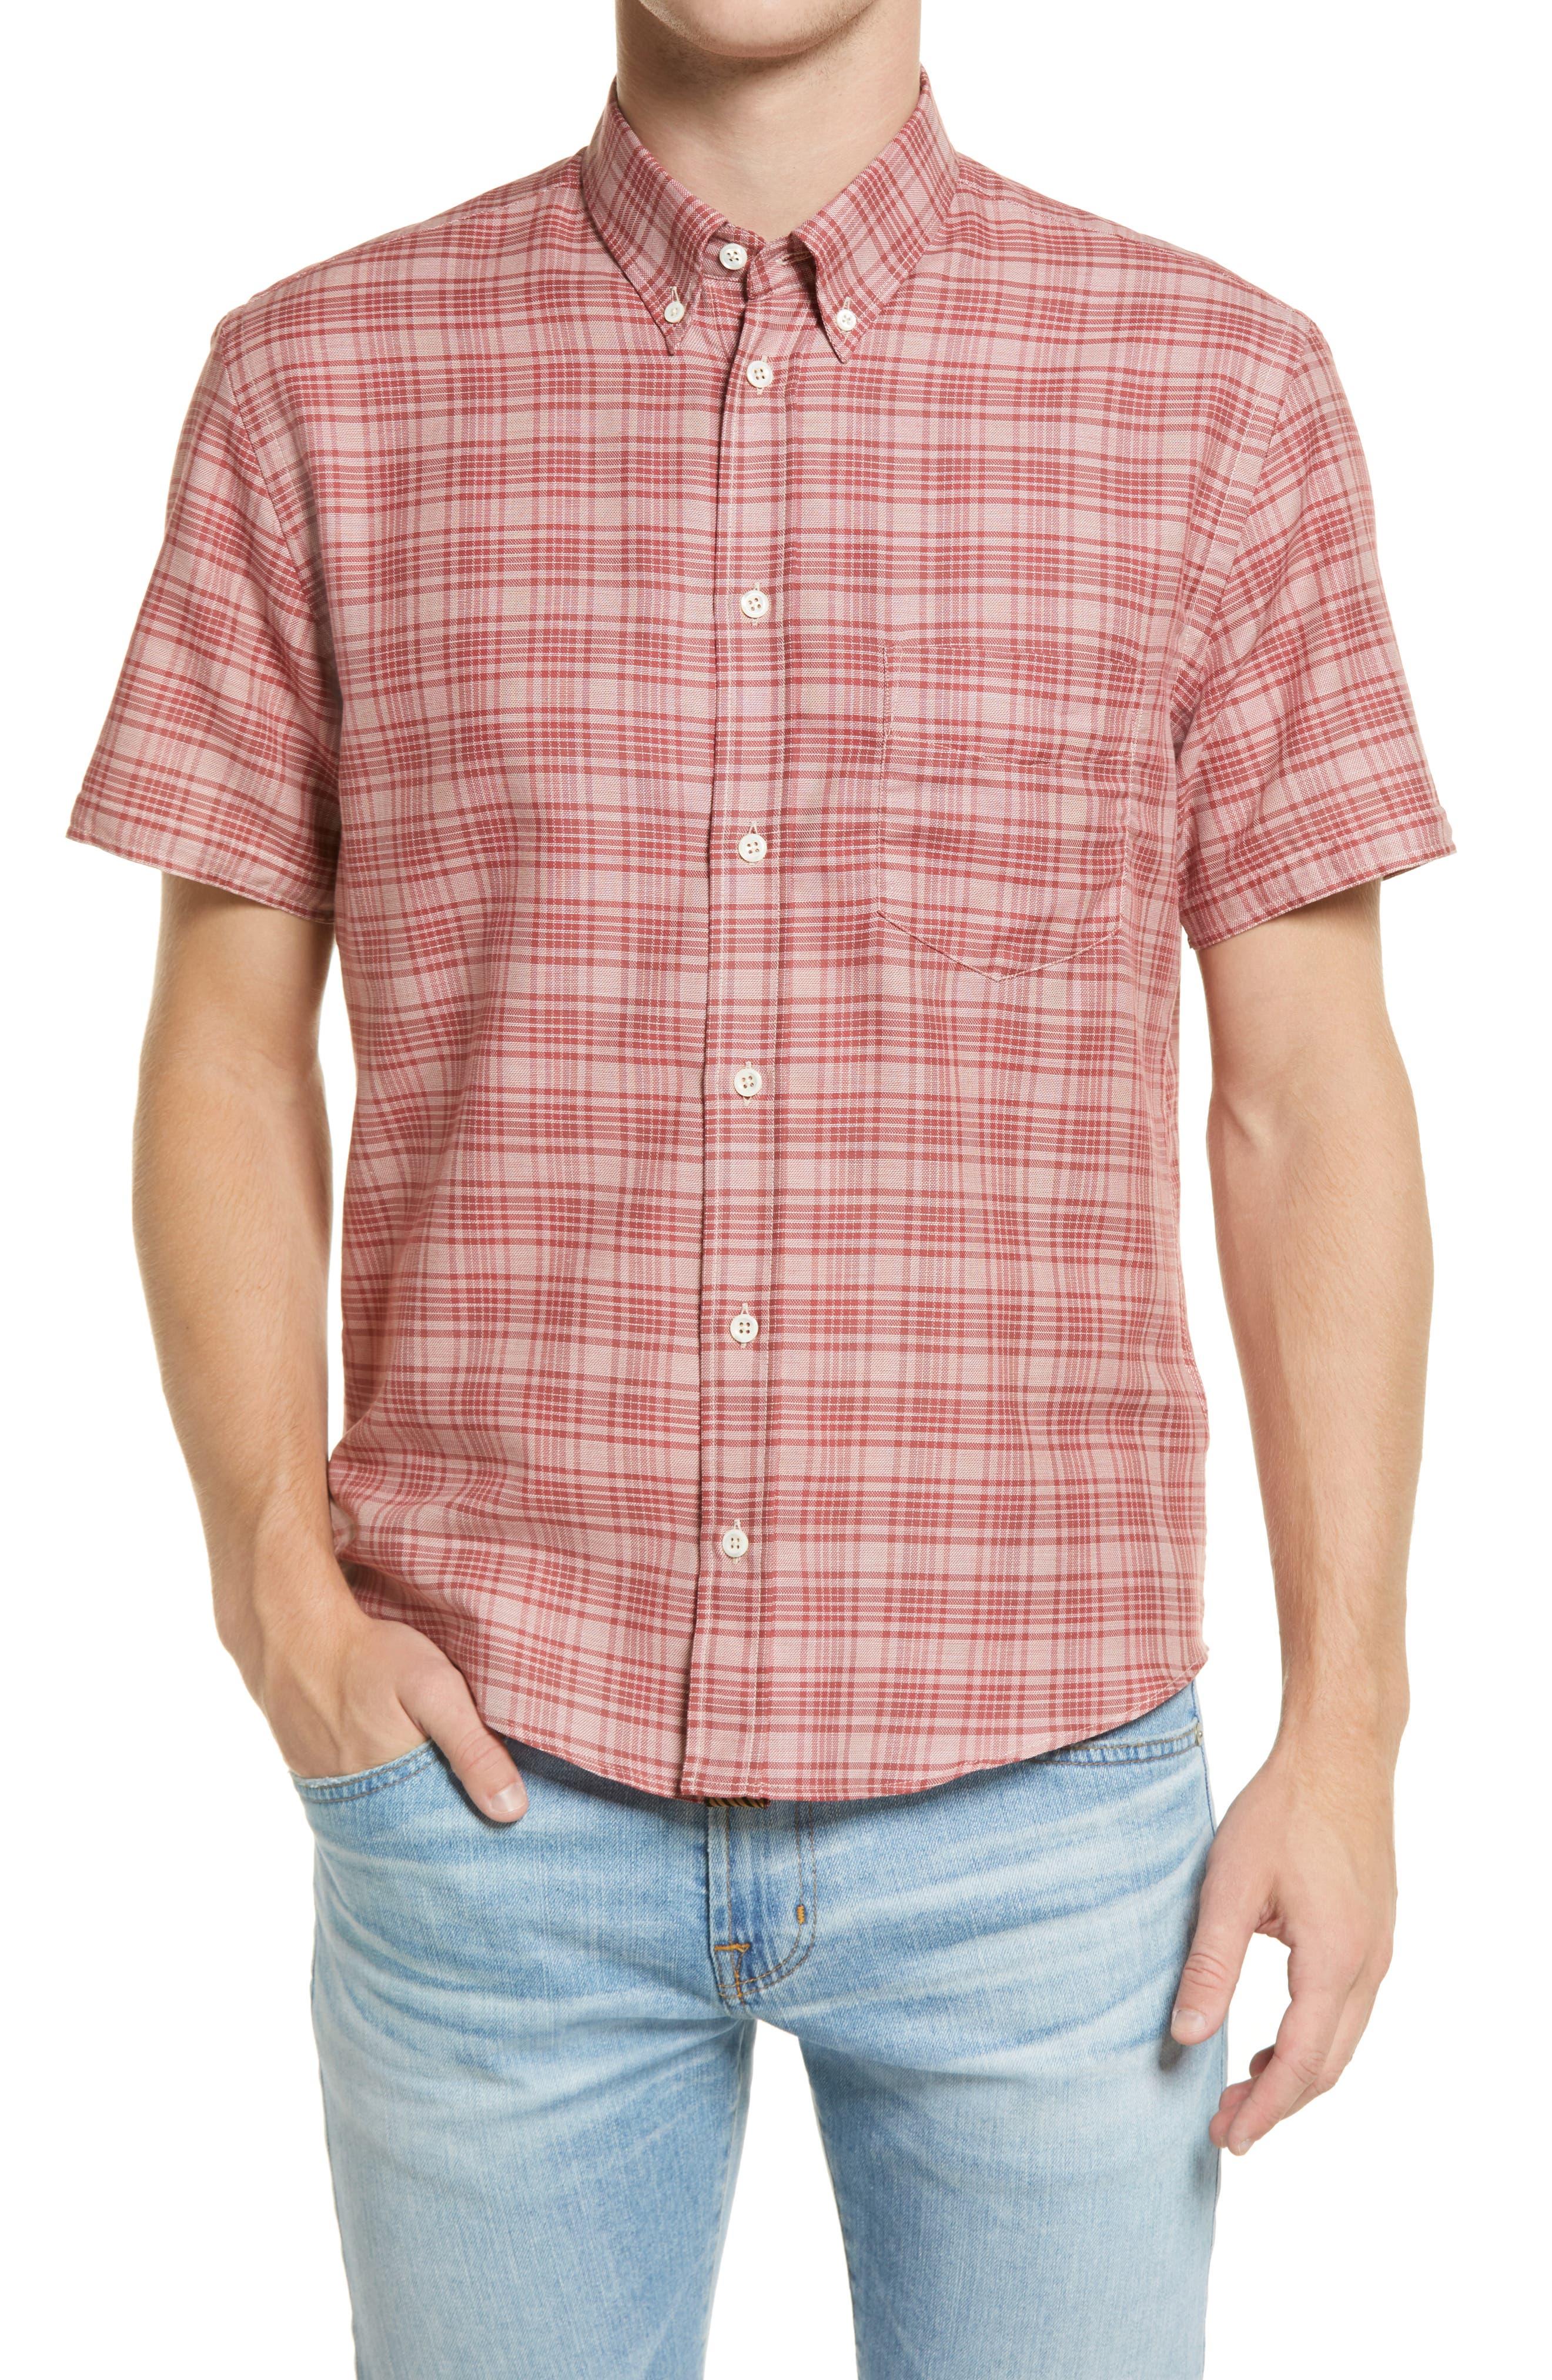 Kirby Slim Fit Plaid Short Sleeve Button-Down Shirt